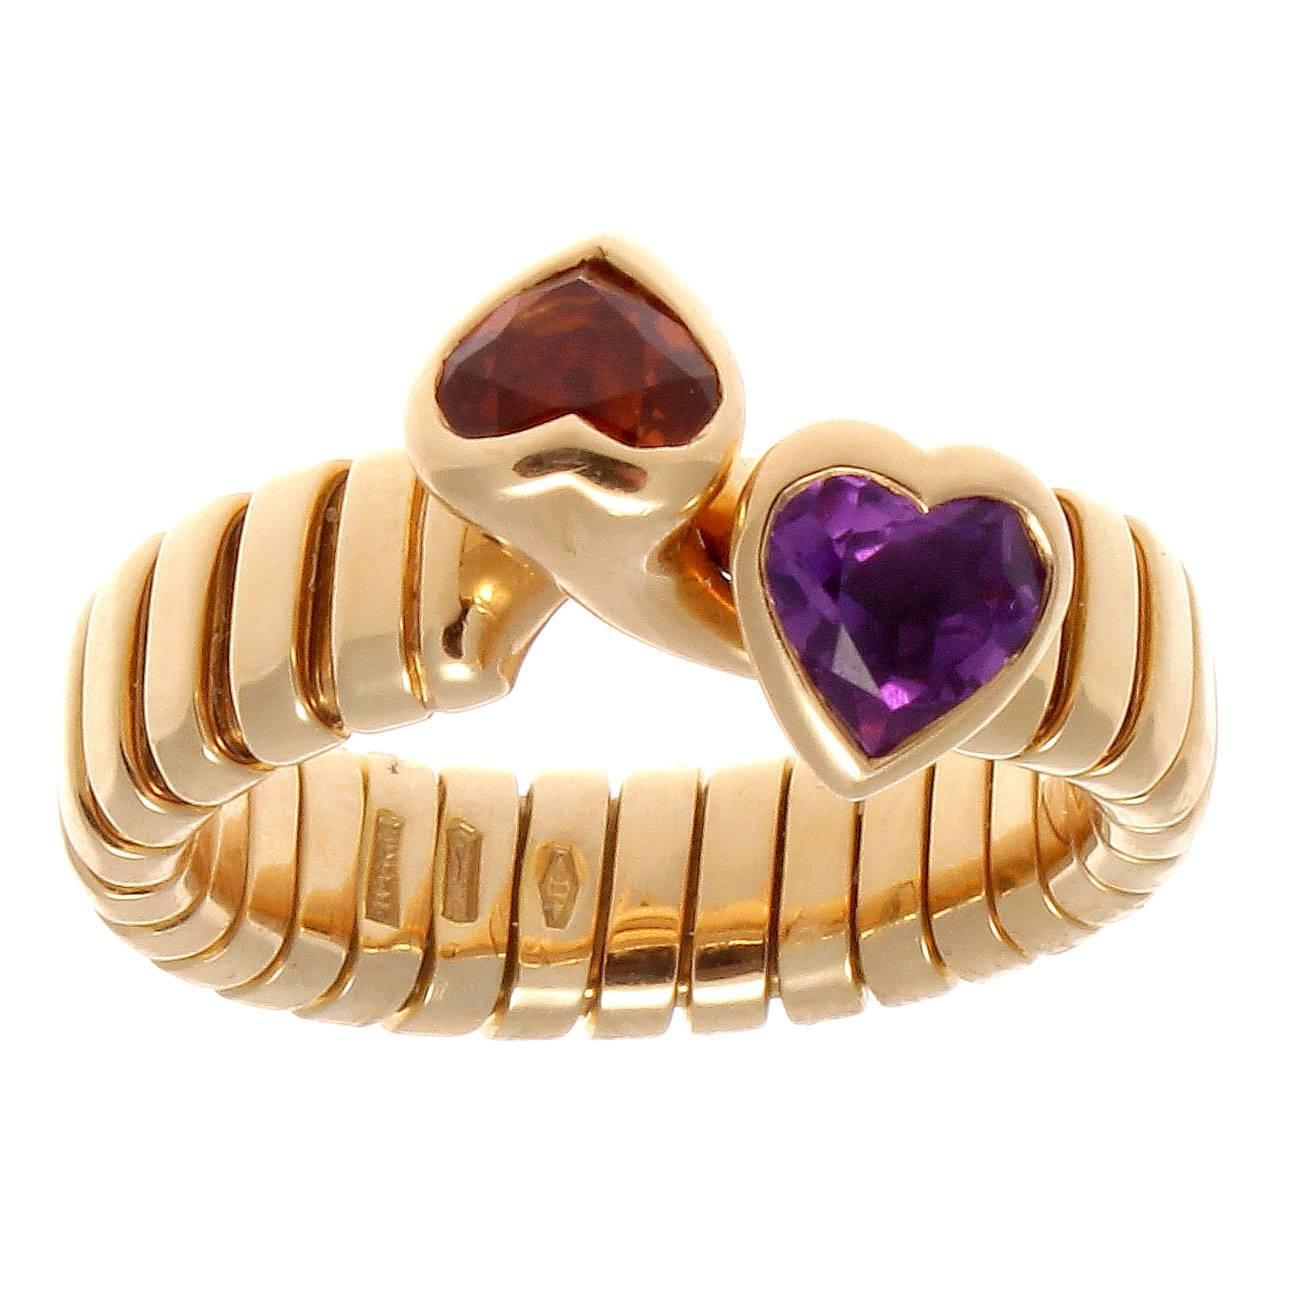 bulgari citrine and amerthyst heart gold ring